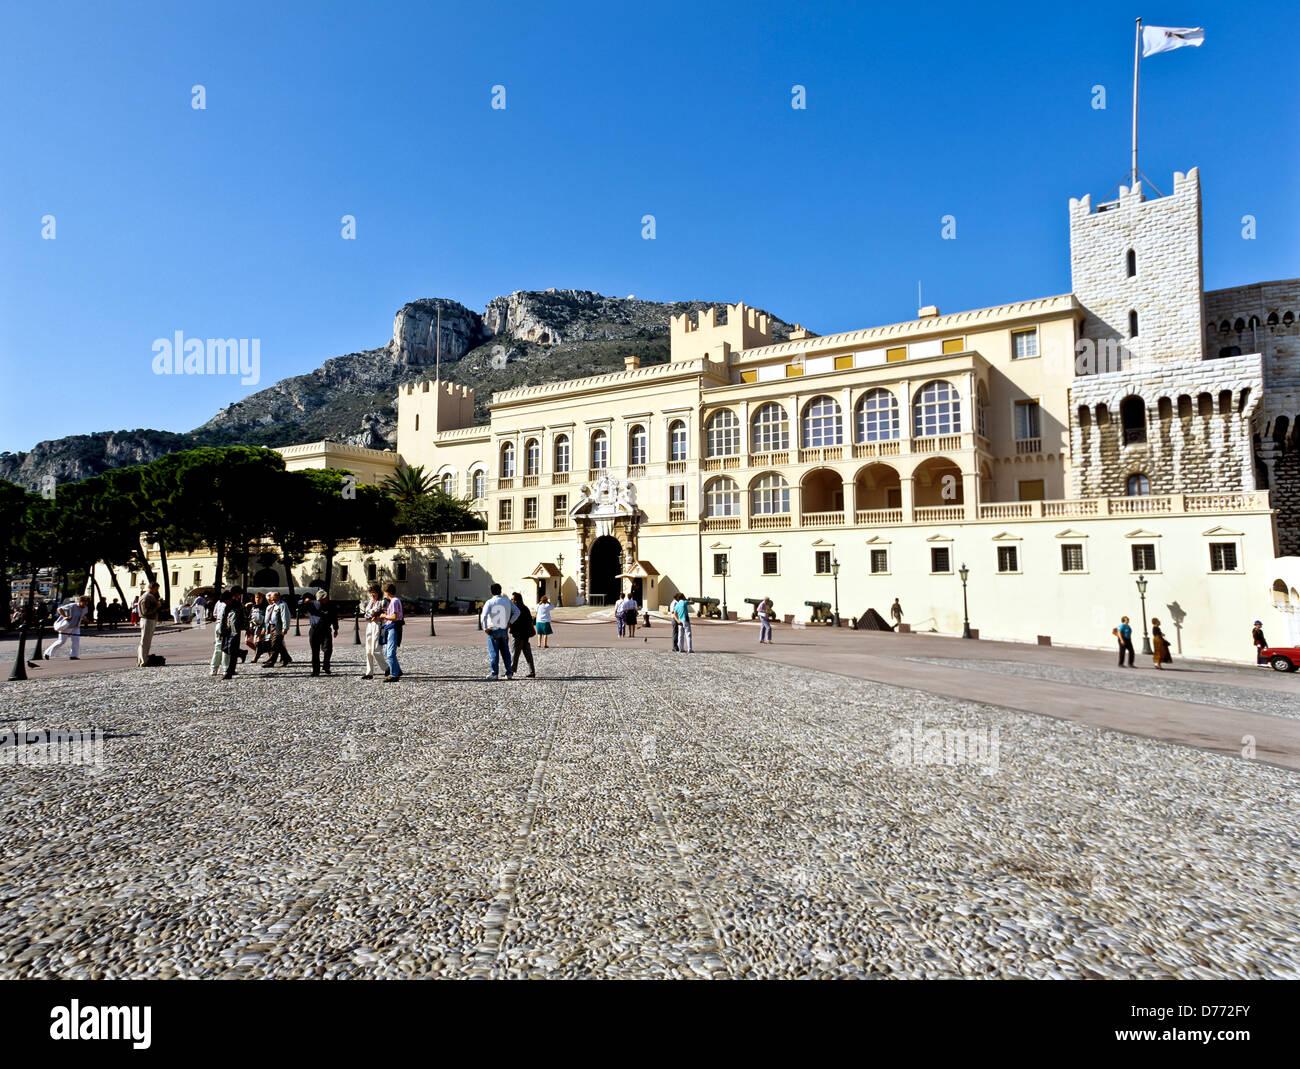 8678. Royal Palace, Principality of Monaco, Europe - Stock Image